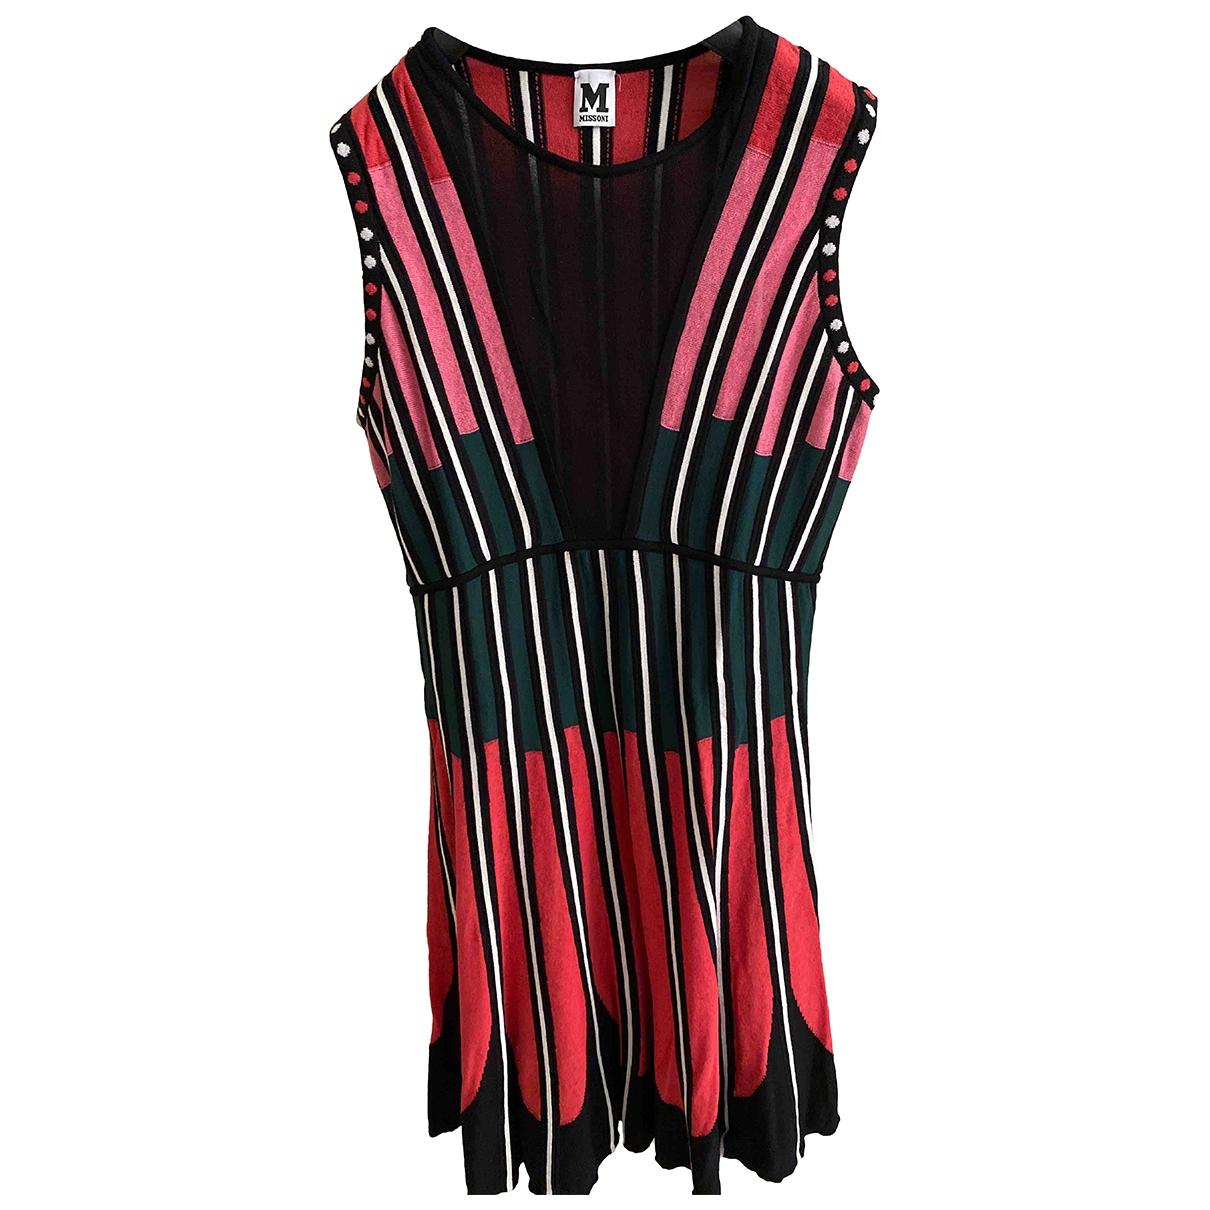 M Missoni \N Burgundy Cotton - elasthane dress for Women 44 IT